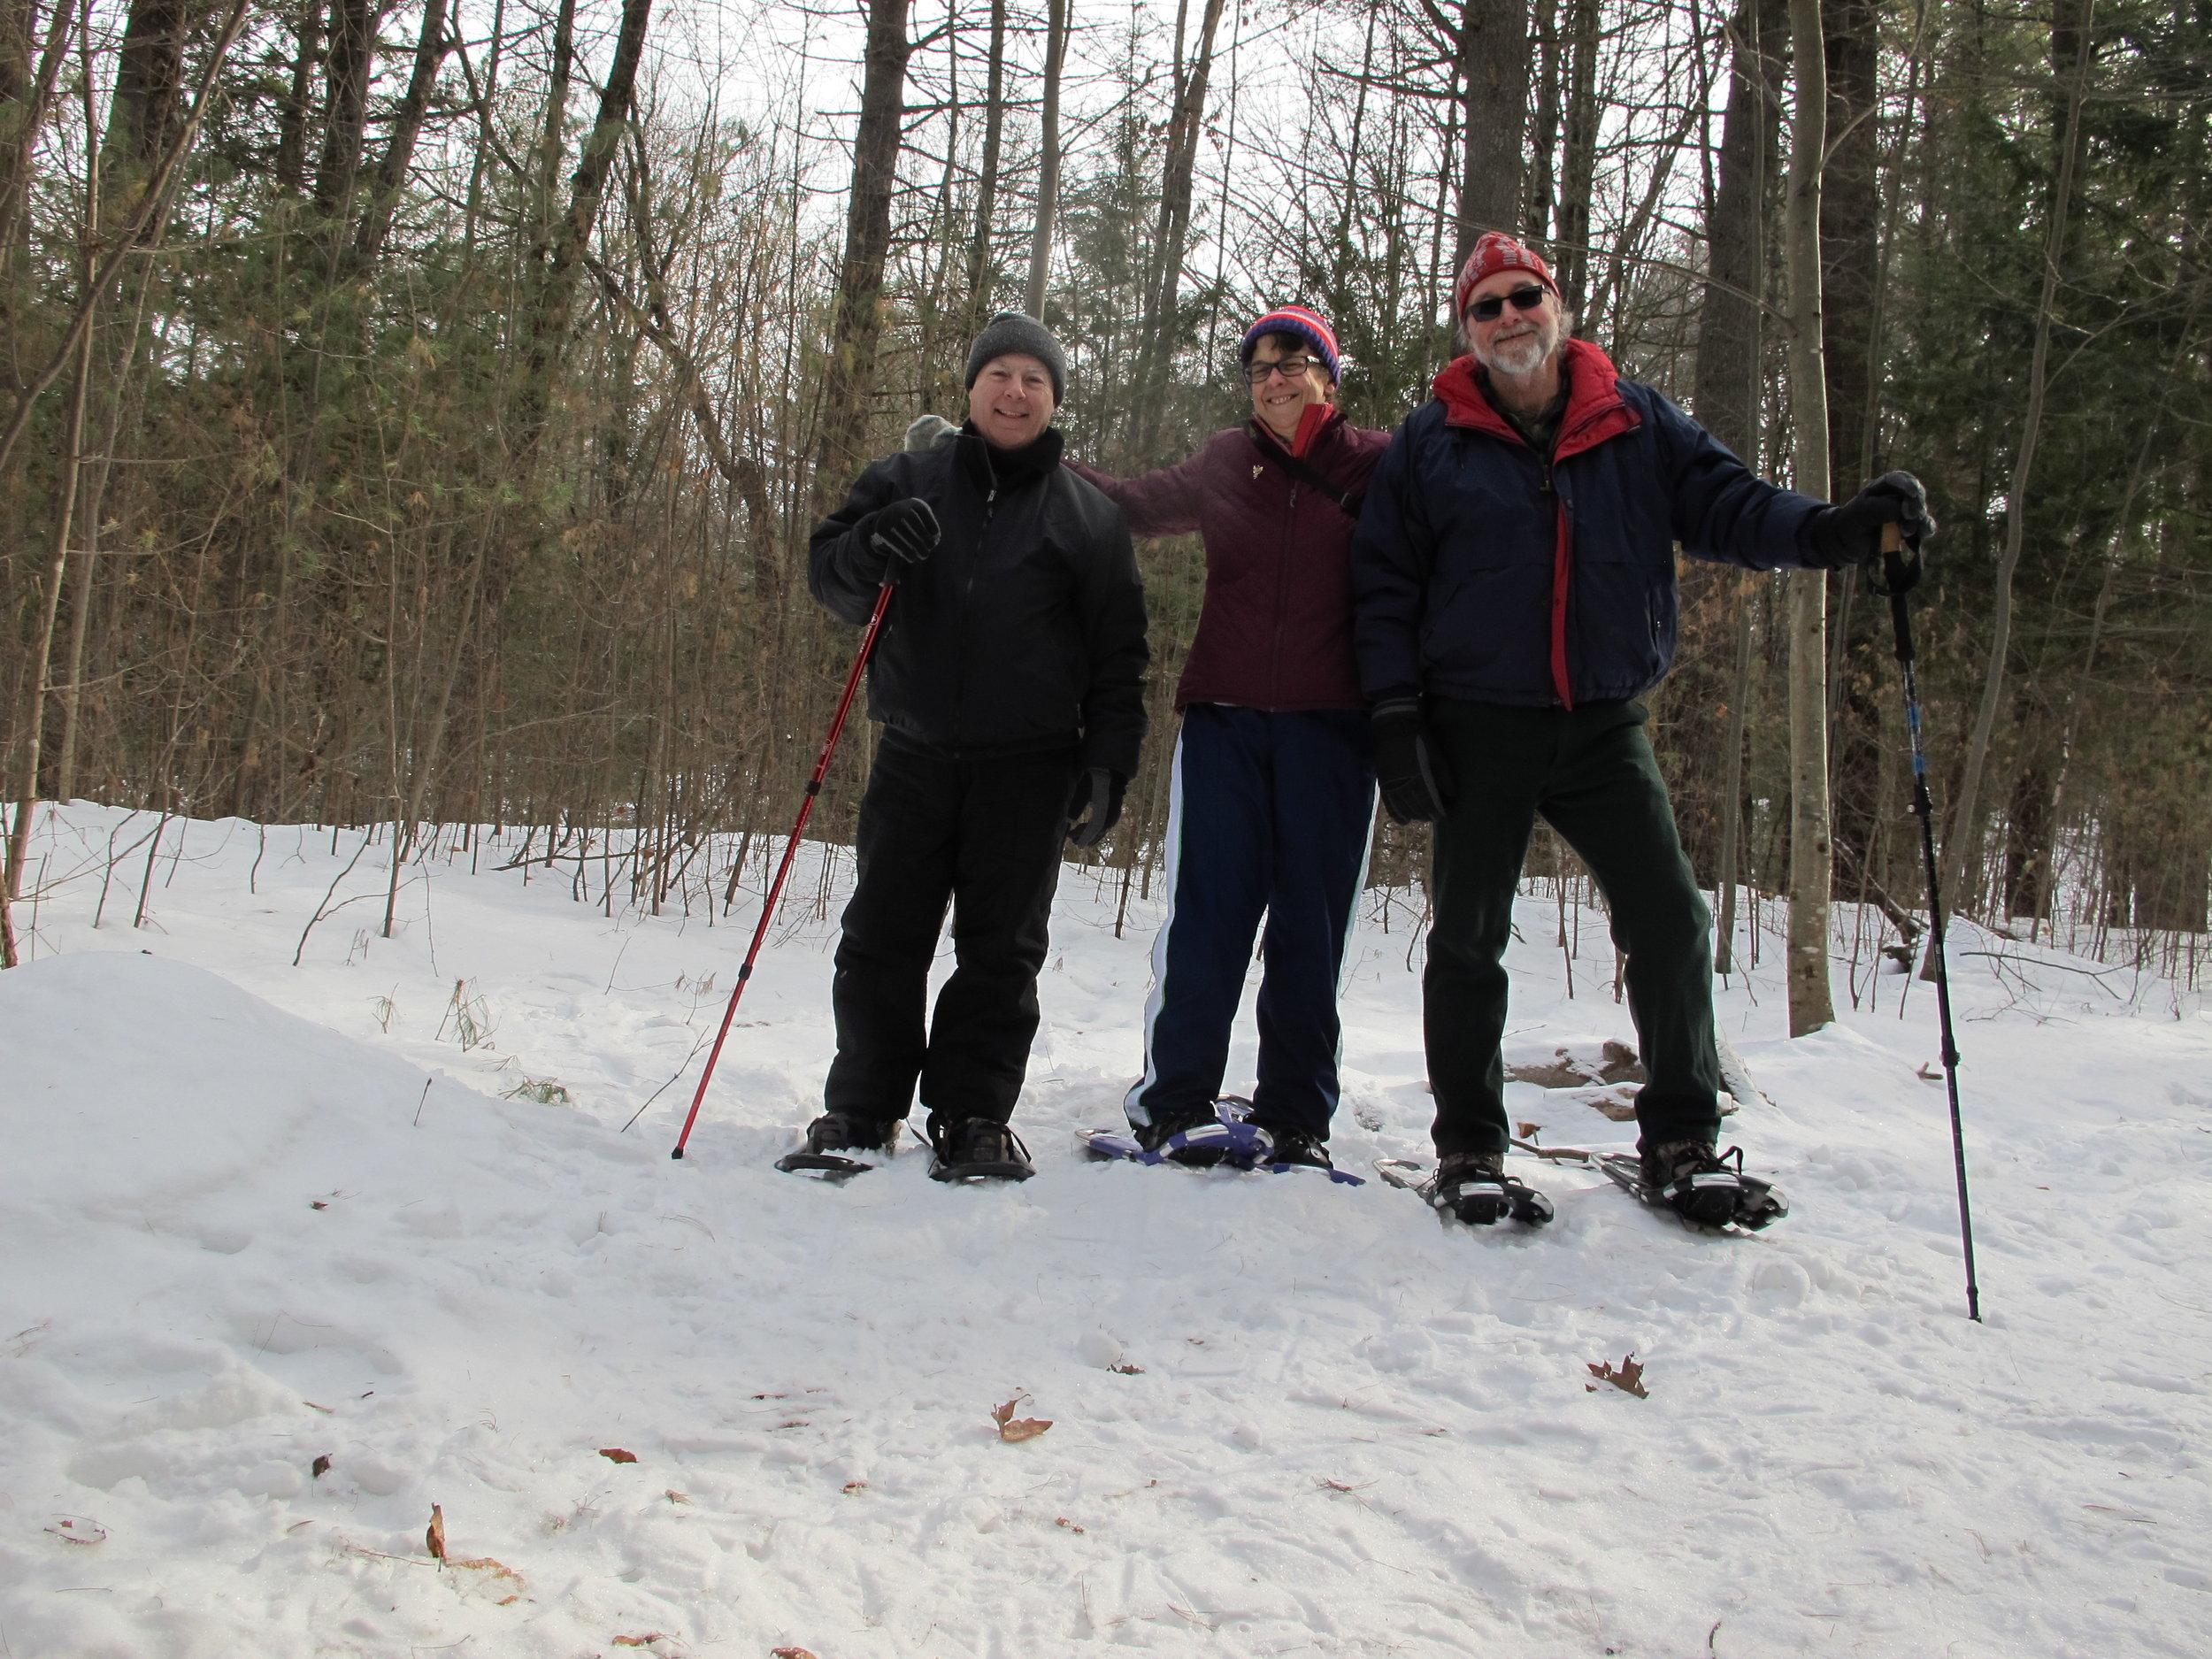 Wilton Camp Saratoga Snowshoe hike